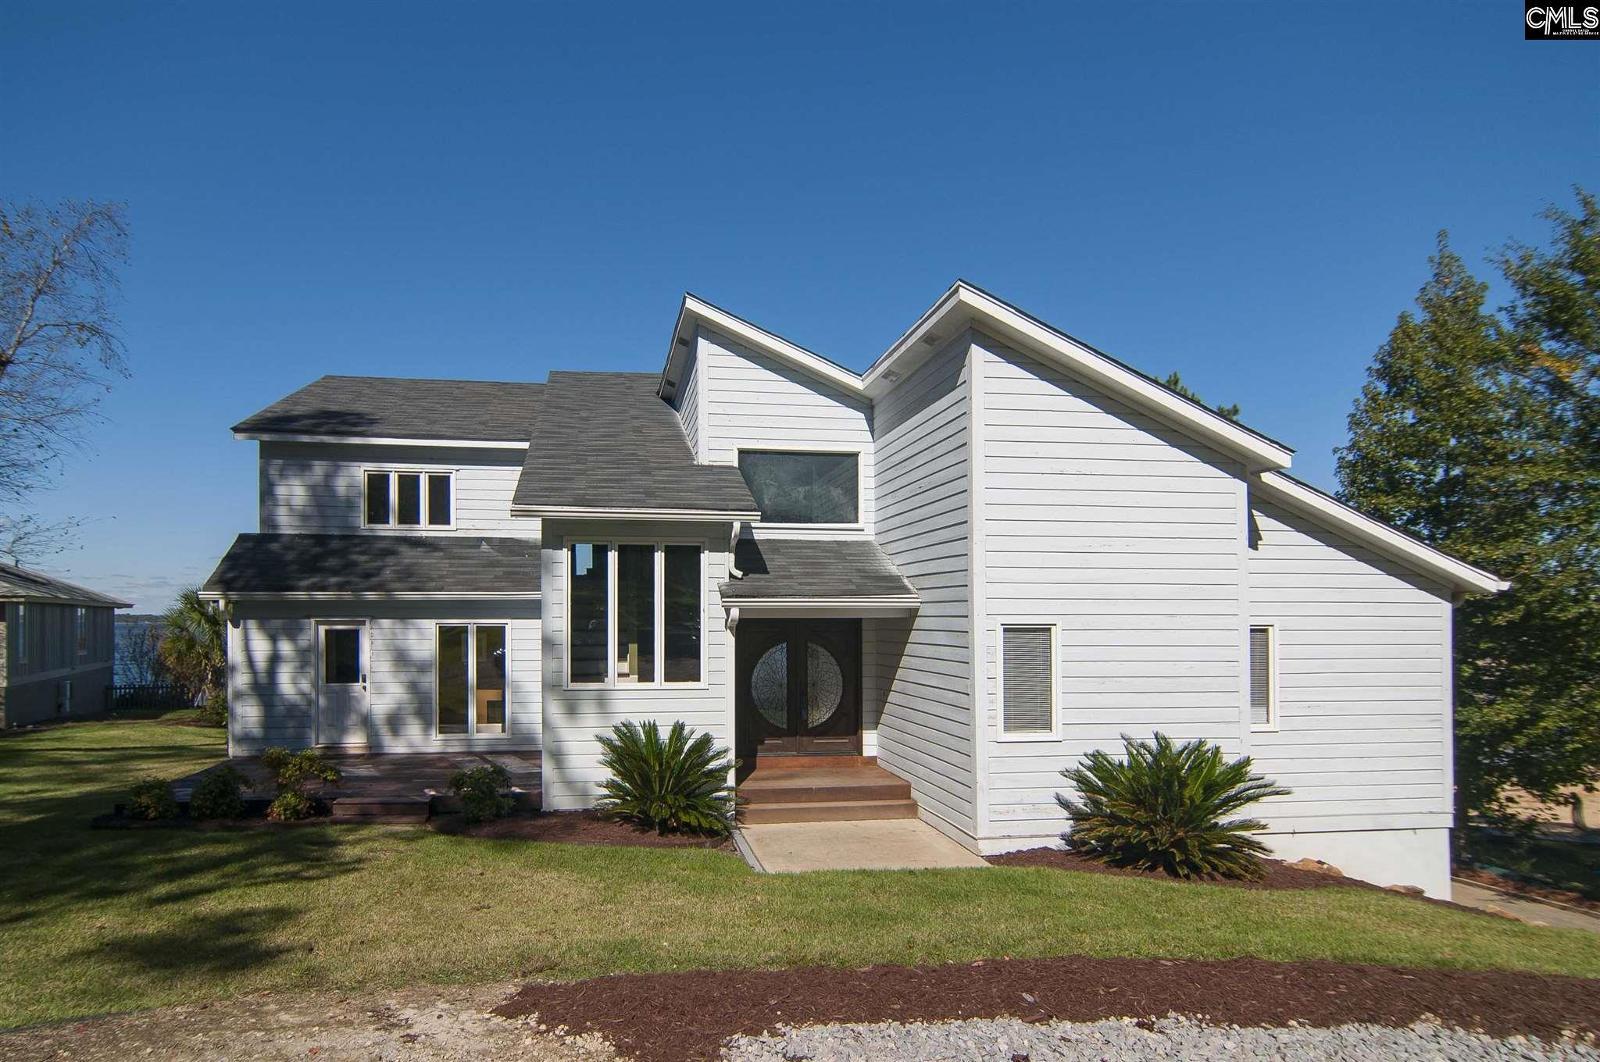 2252 old cherokee rd lexington sc mls 435081 for Home builders lexington sc